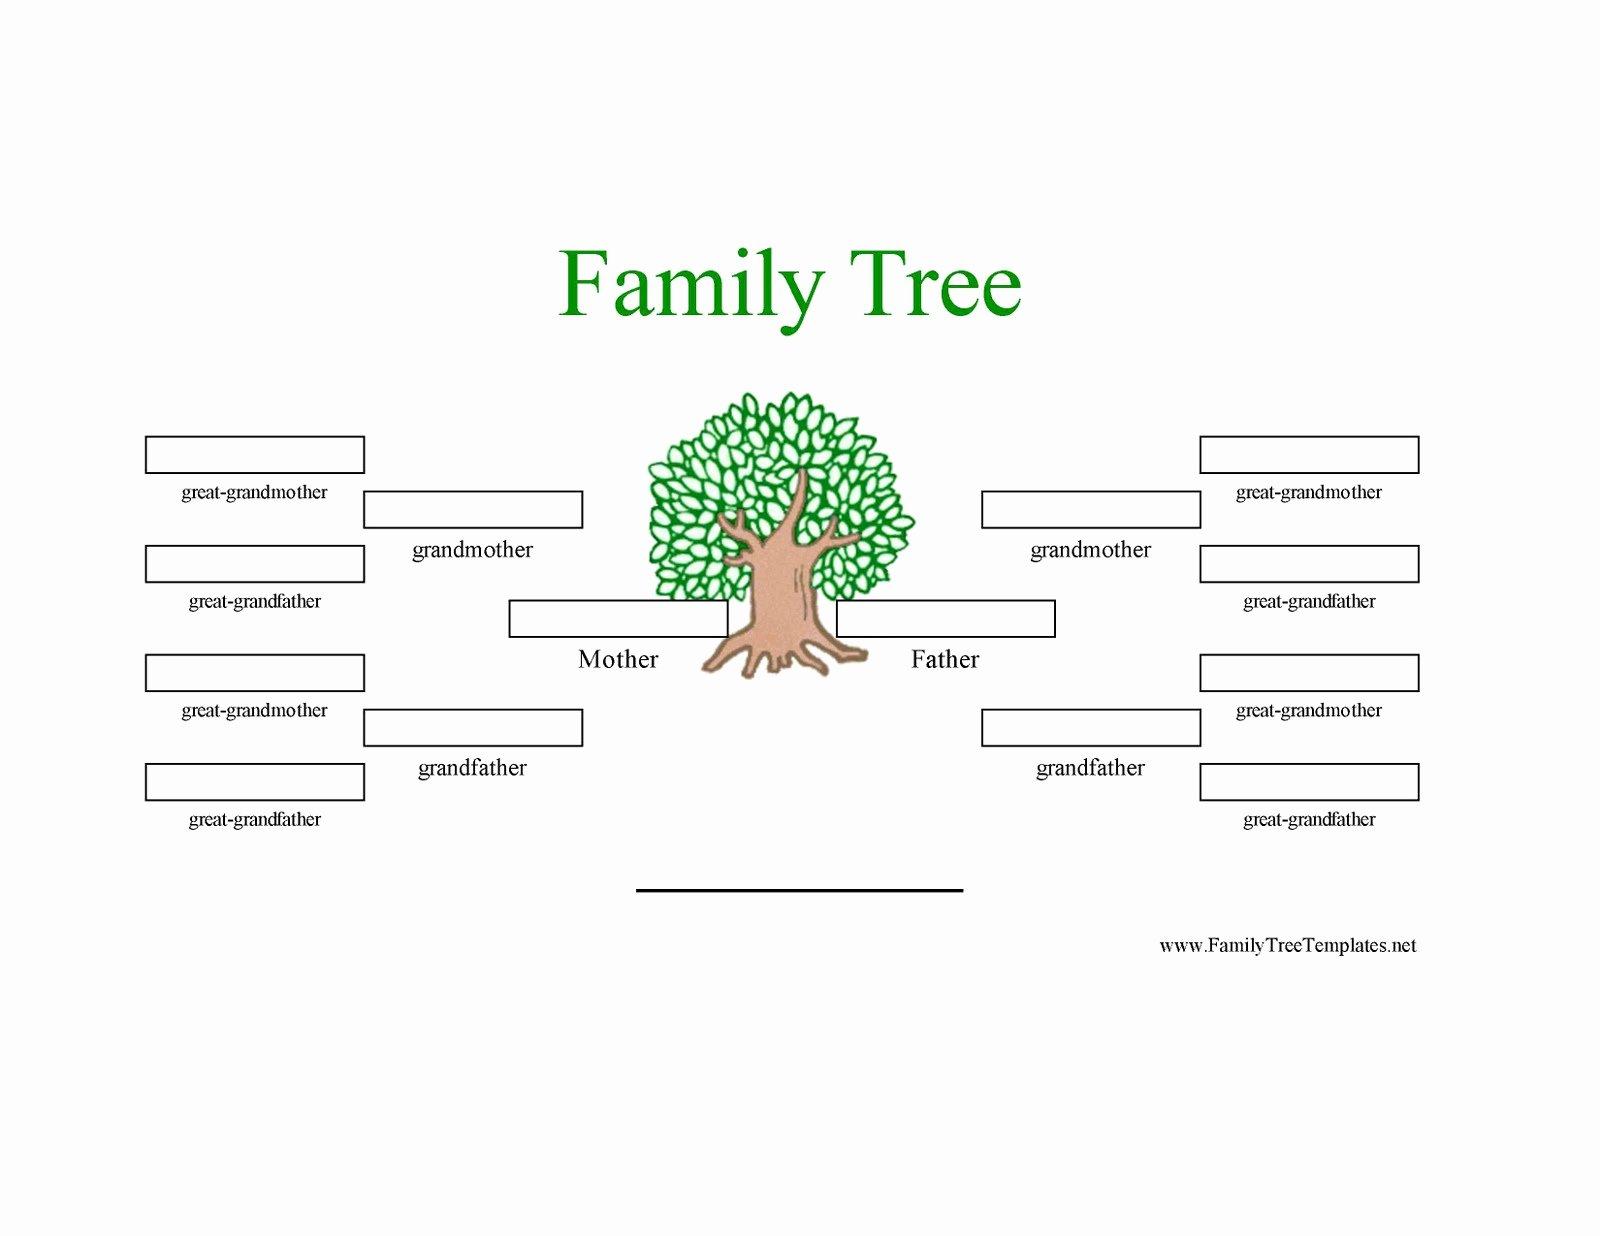 4 Generation Family Tree Template New Family Tree Template Family Tree Template 3 Generations